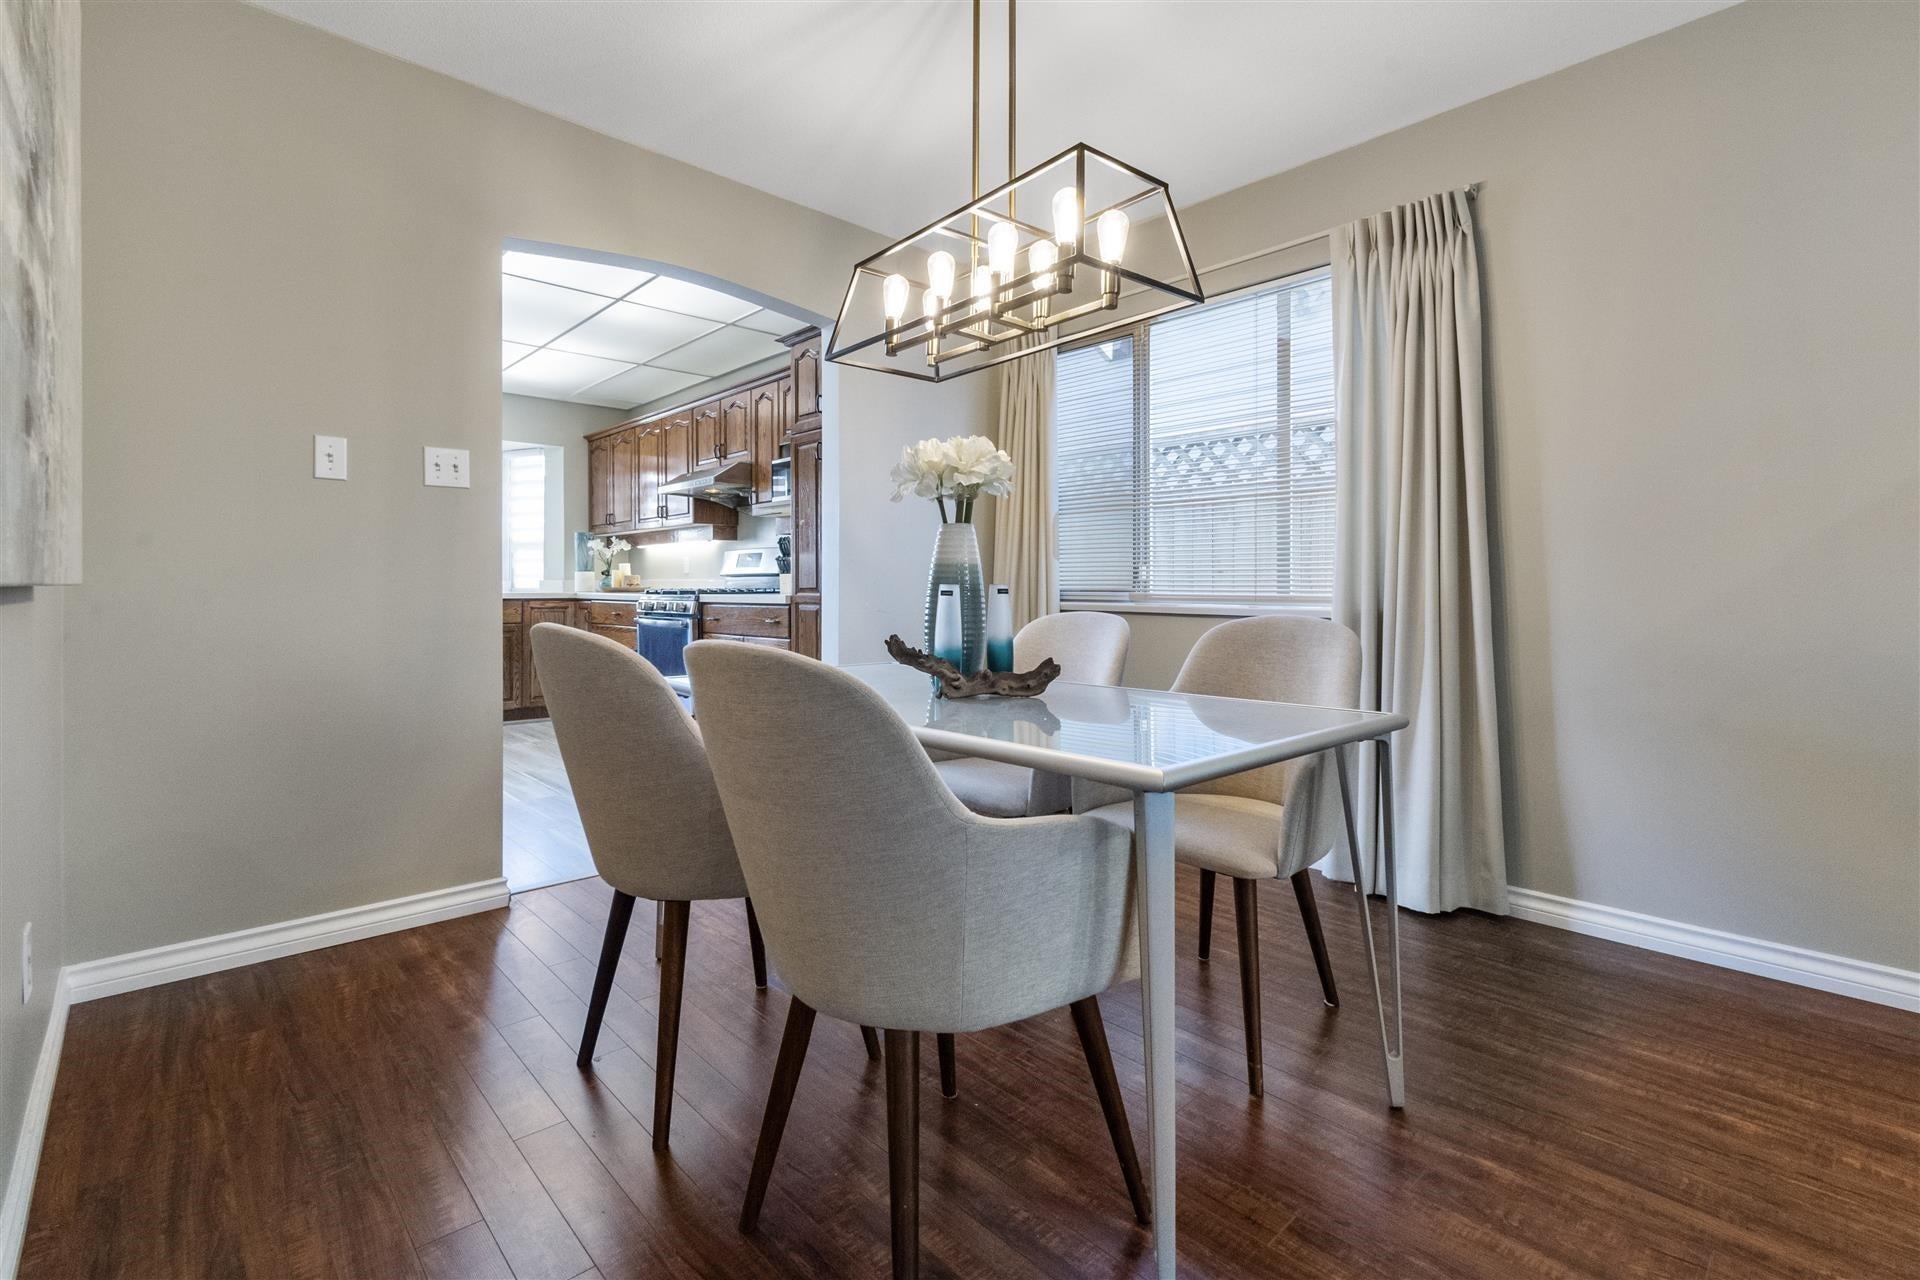 3631 GEORGIA STREET - Steveston Village House/Single Family for sale, 3 Bedrooms (R2623894) - #4